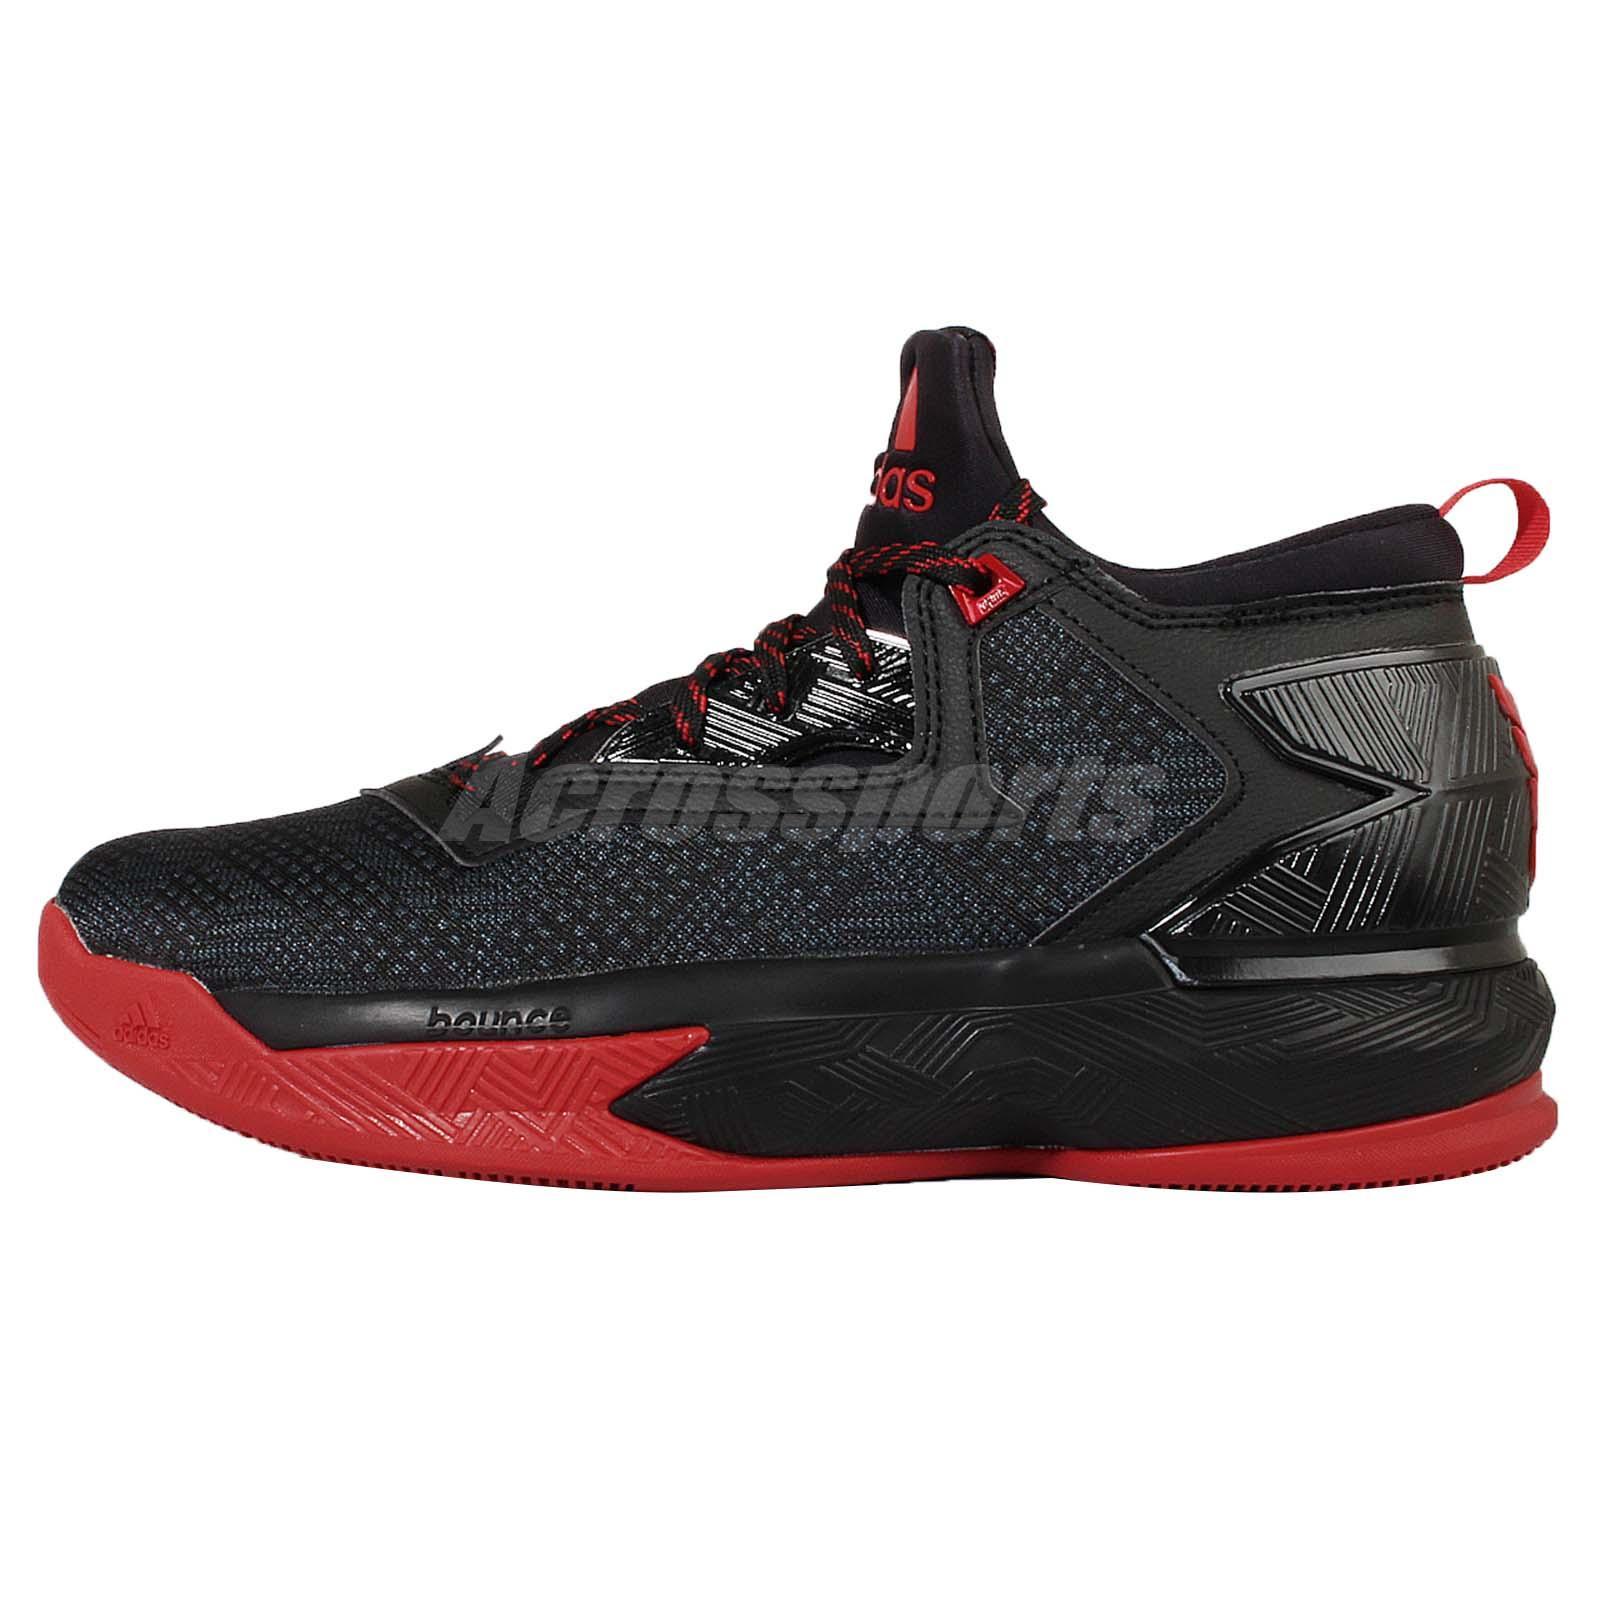 adidas new shoes 2014 basketball adidou